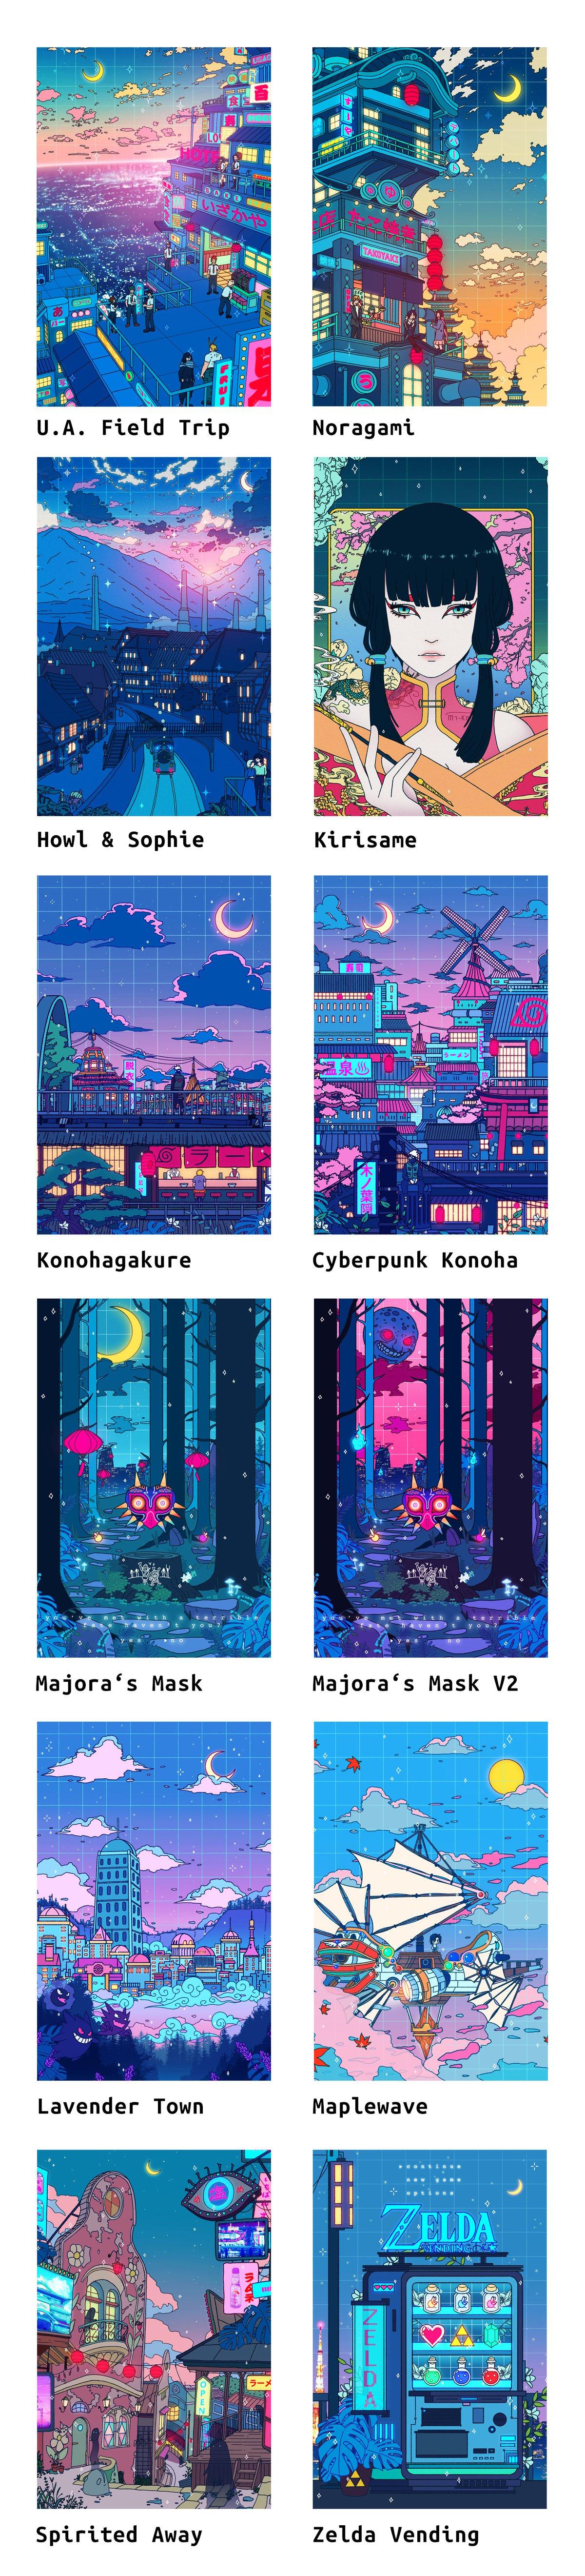 "Image of 11 x 17"" Art Prints"